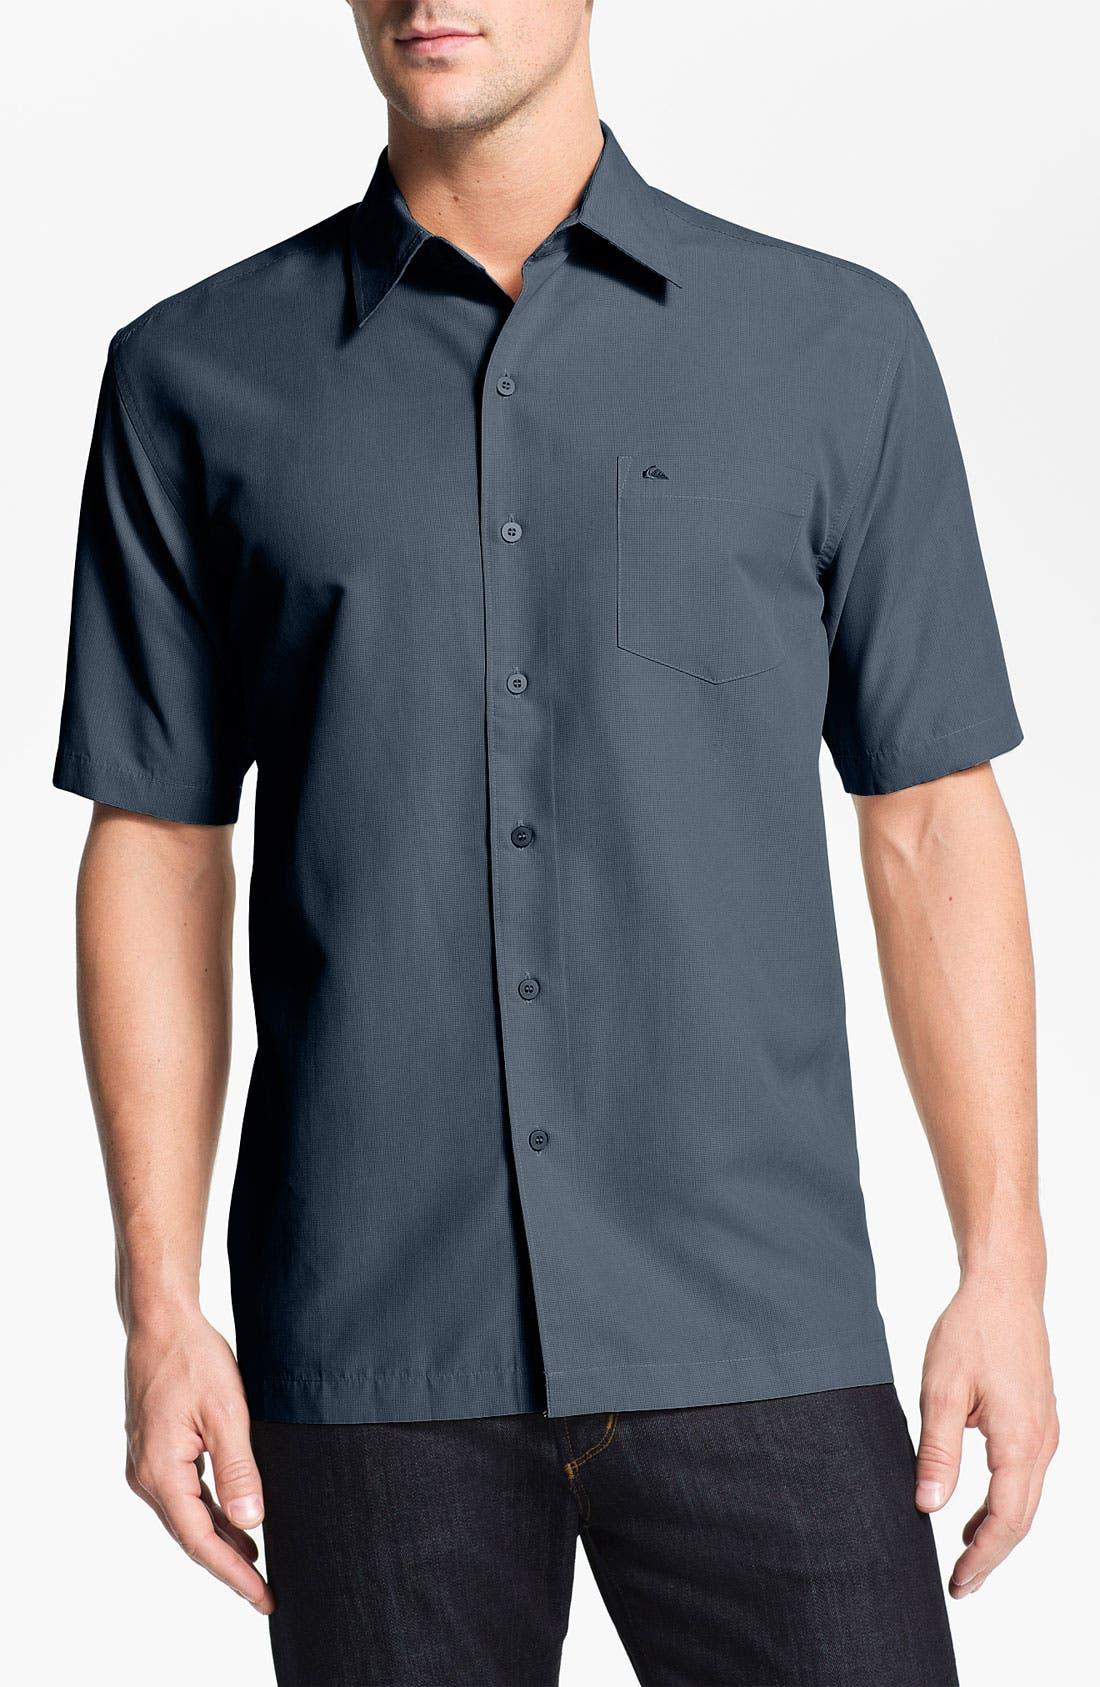 Main Image - Quiksilver 'Encinitas' Woven Shirt